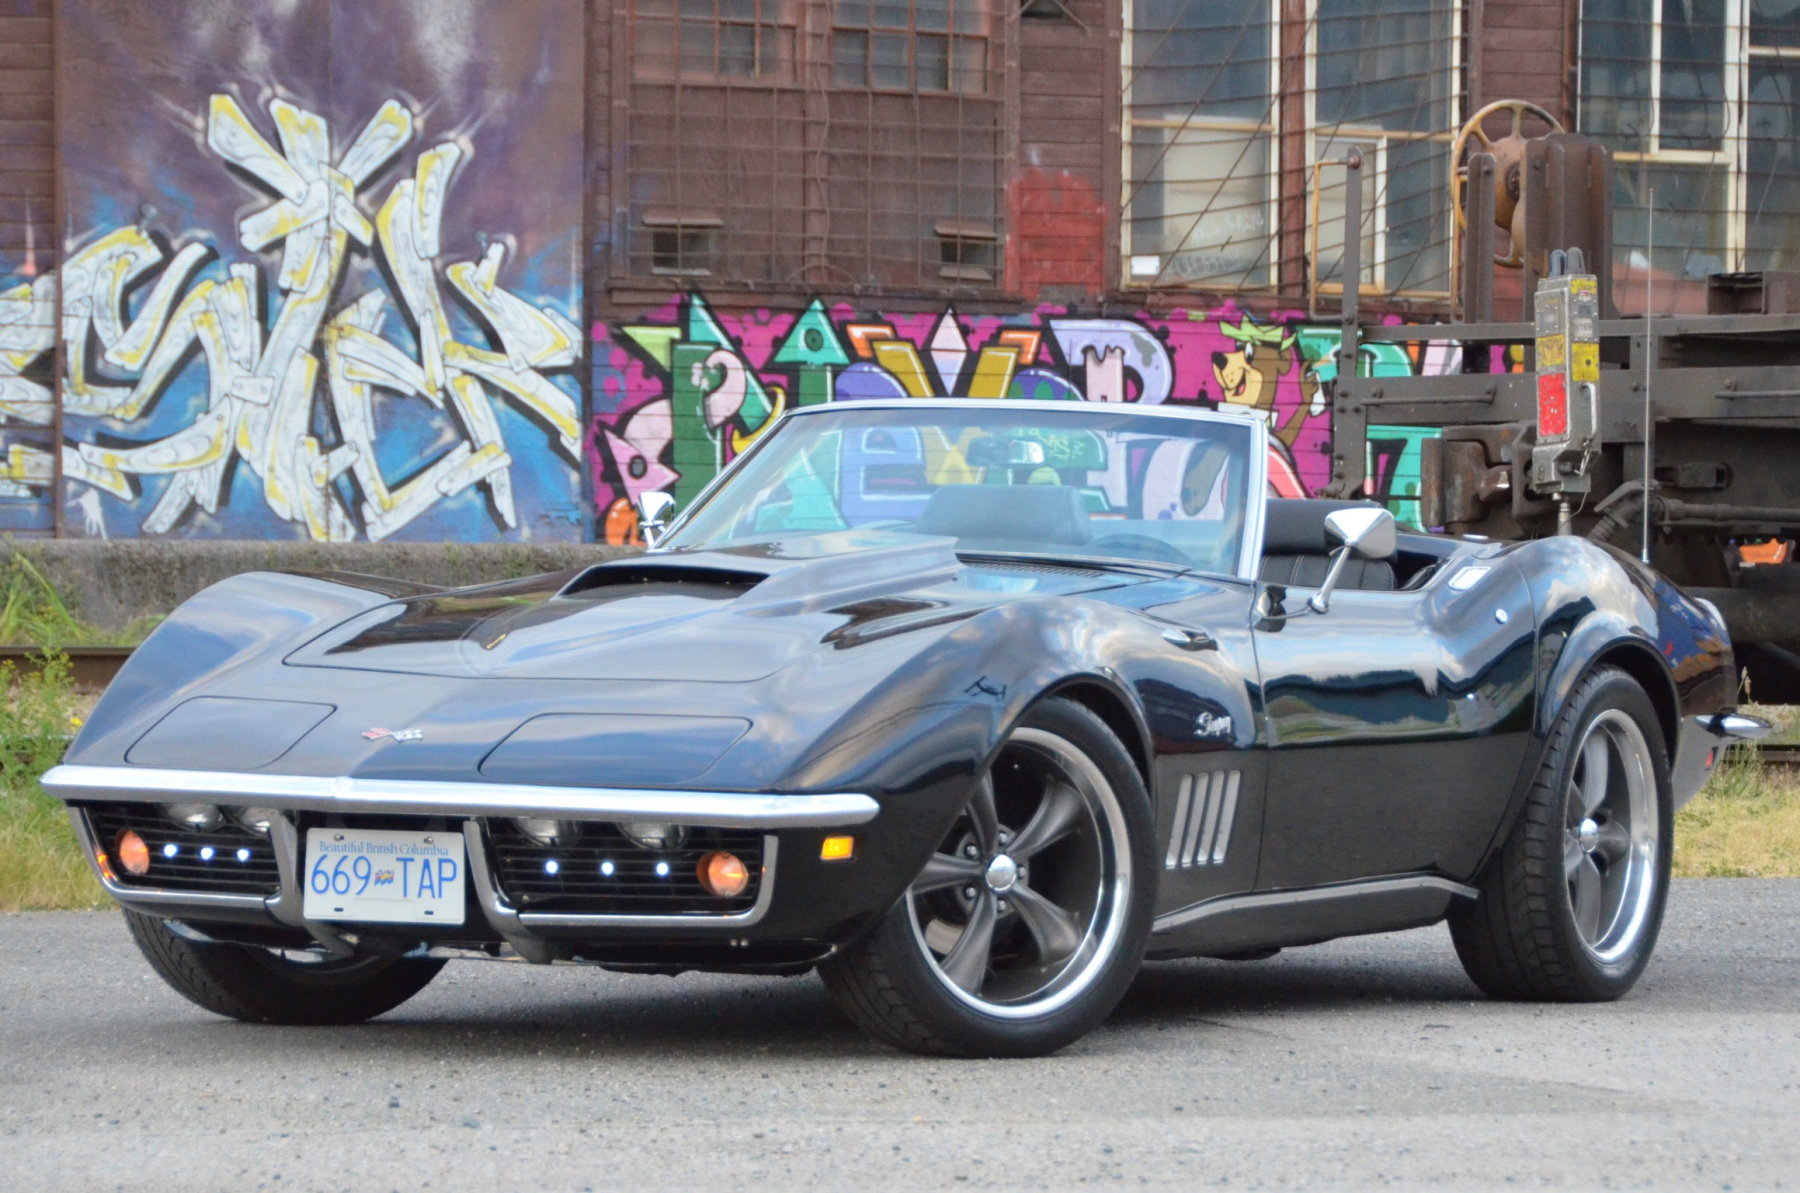 '69 Corvette Stingray Graffiti